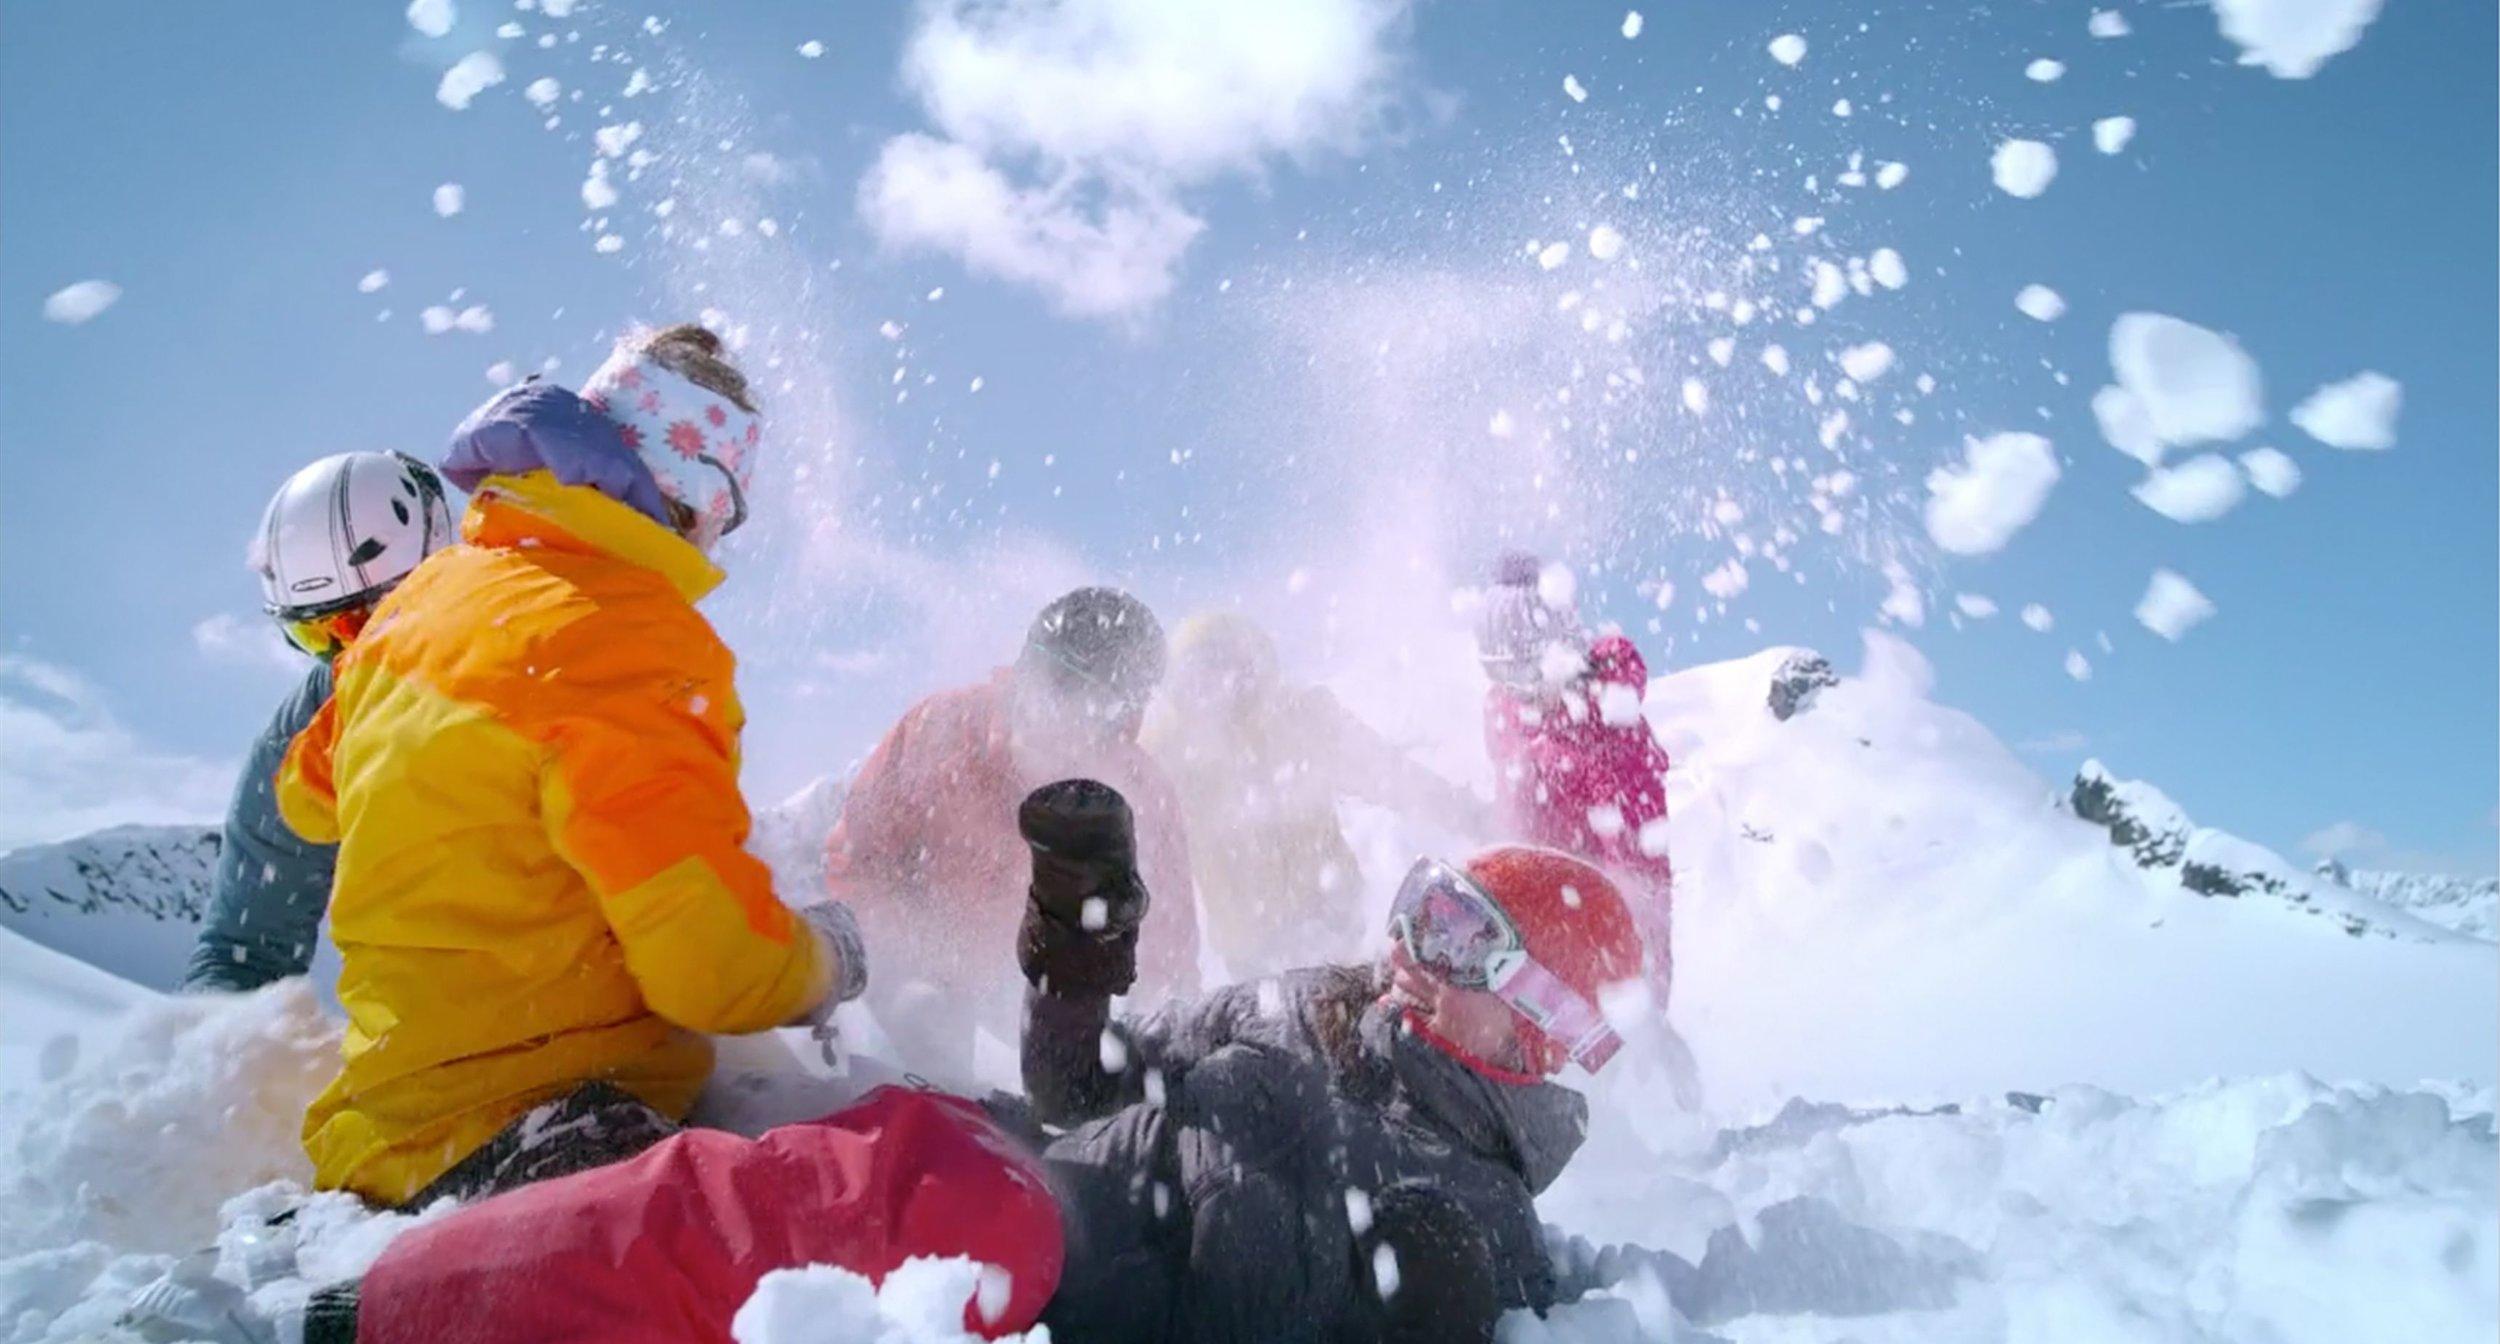 Skier Snowball Fights